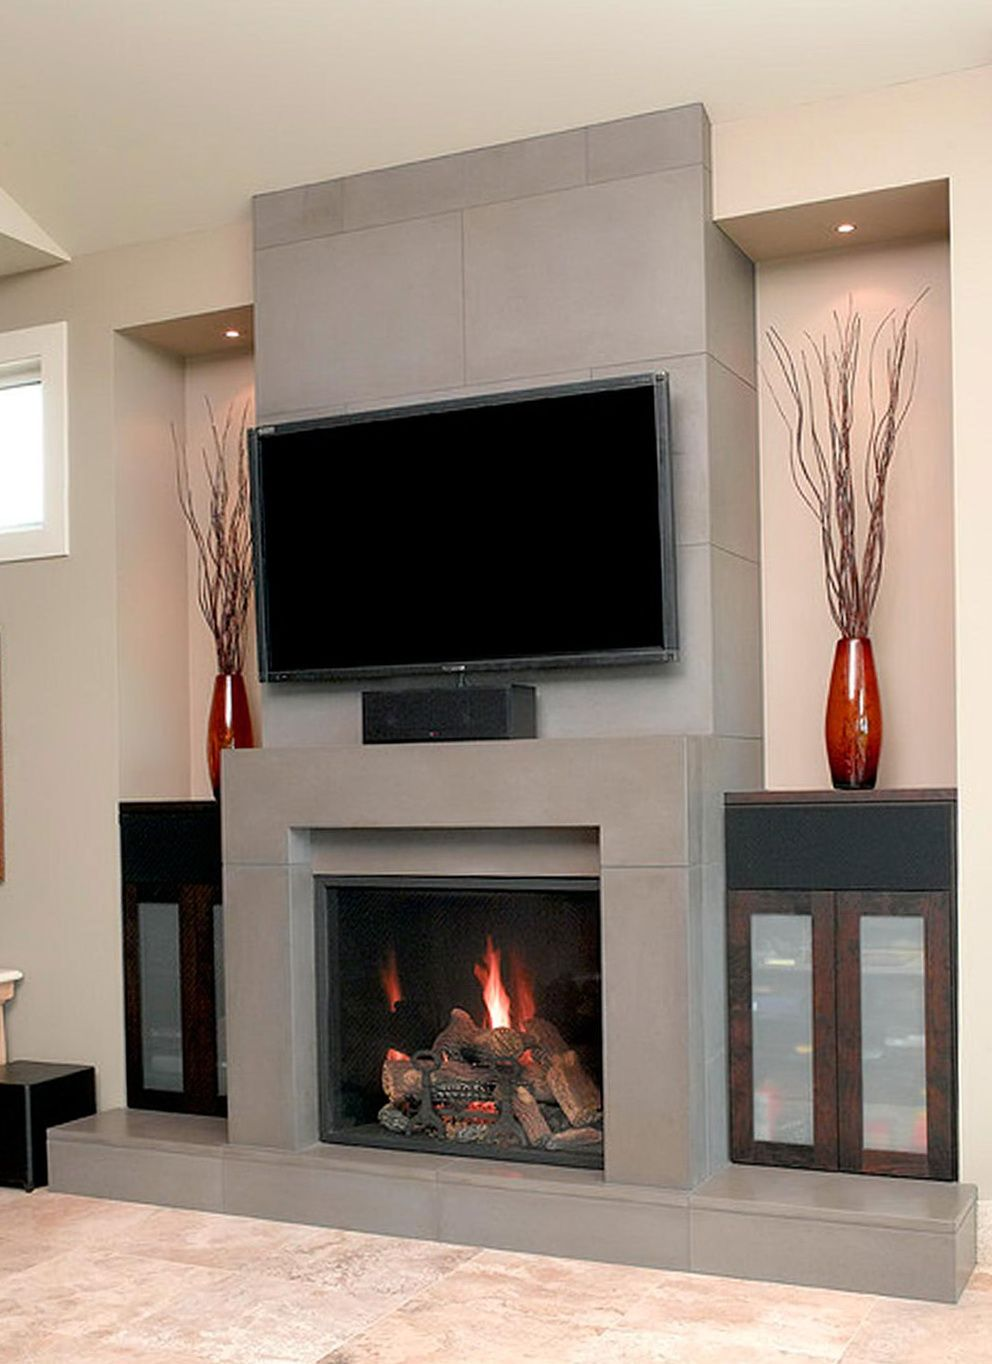 Contemporary Fireplace Designs With Tv Above Home Design I